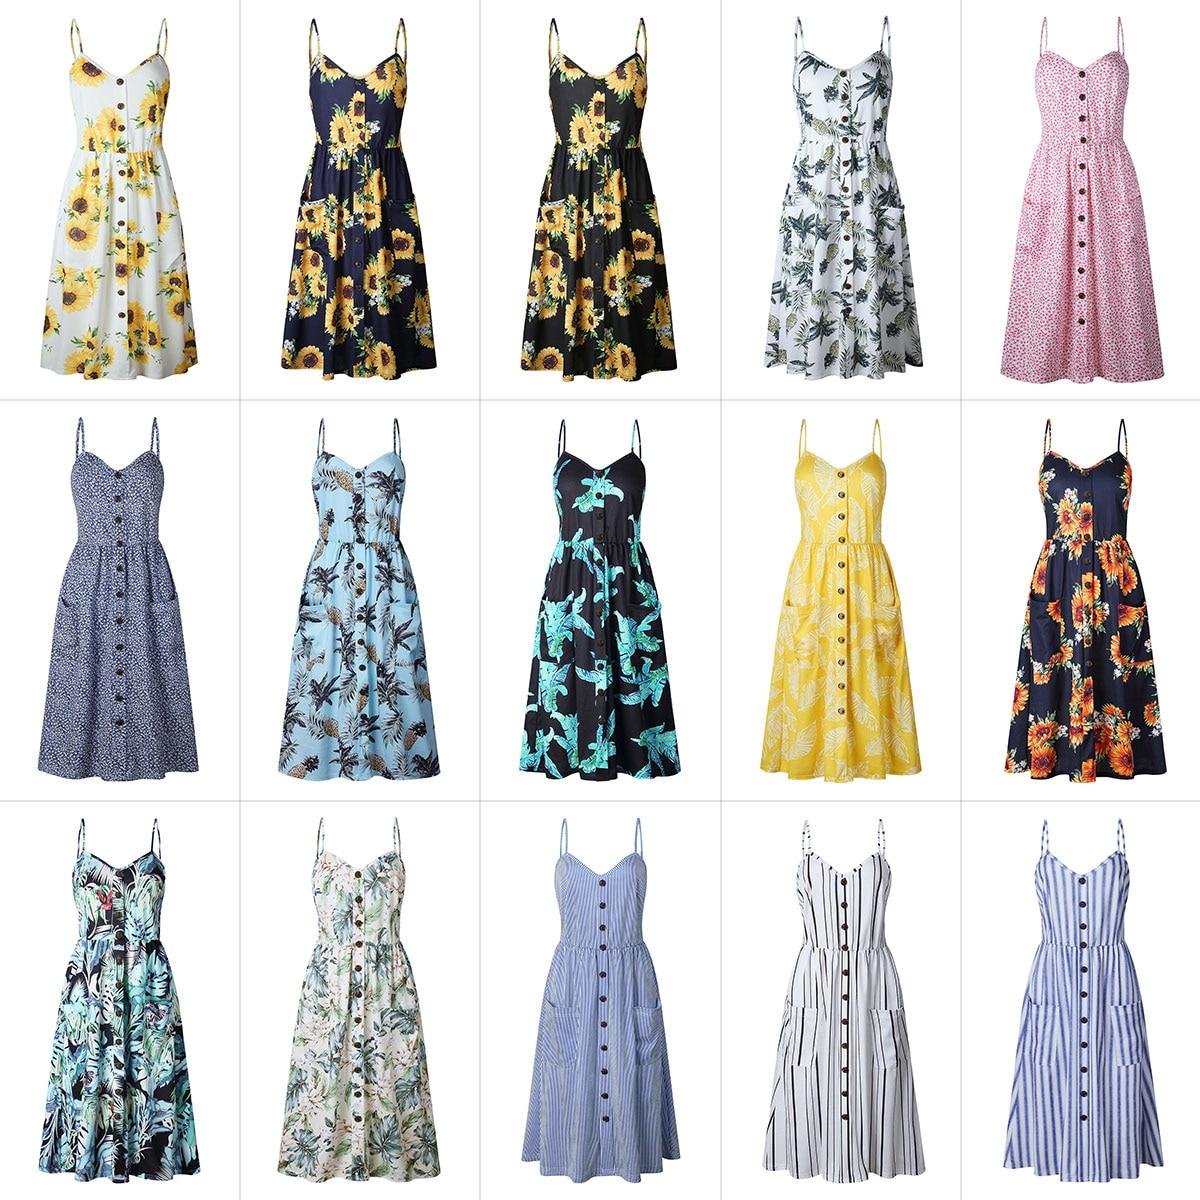 2019 Summer Women Button Decorated Print Dress Off-shoulder Party Beach Sundress Boho Spaghetti Long Dresses Plus Size FICUSRONG 4